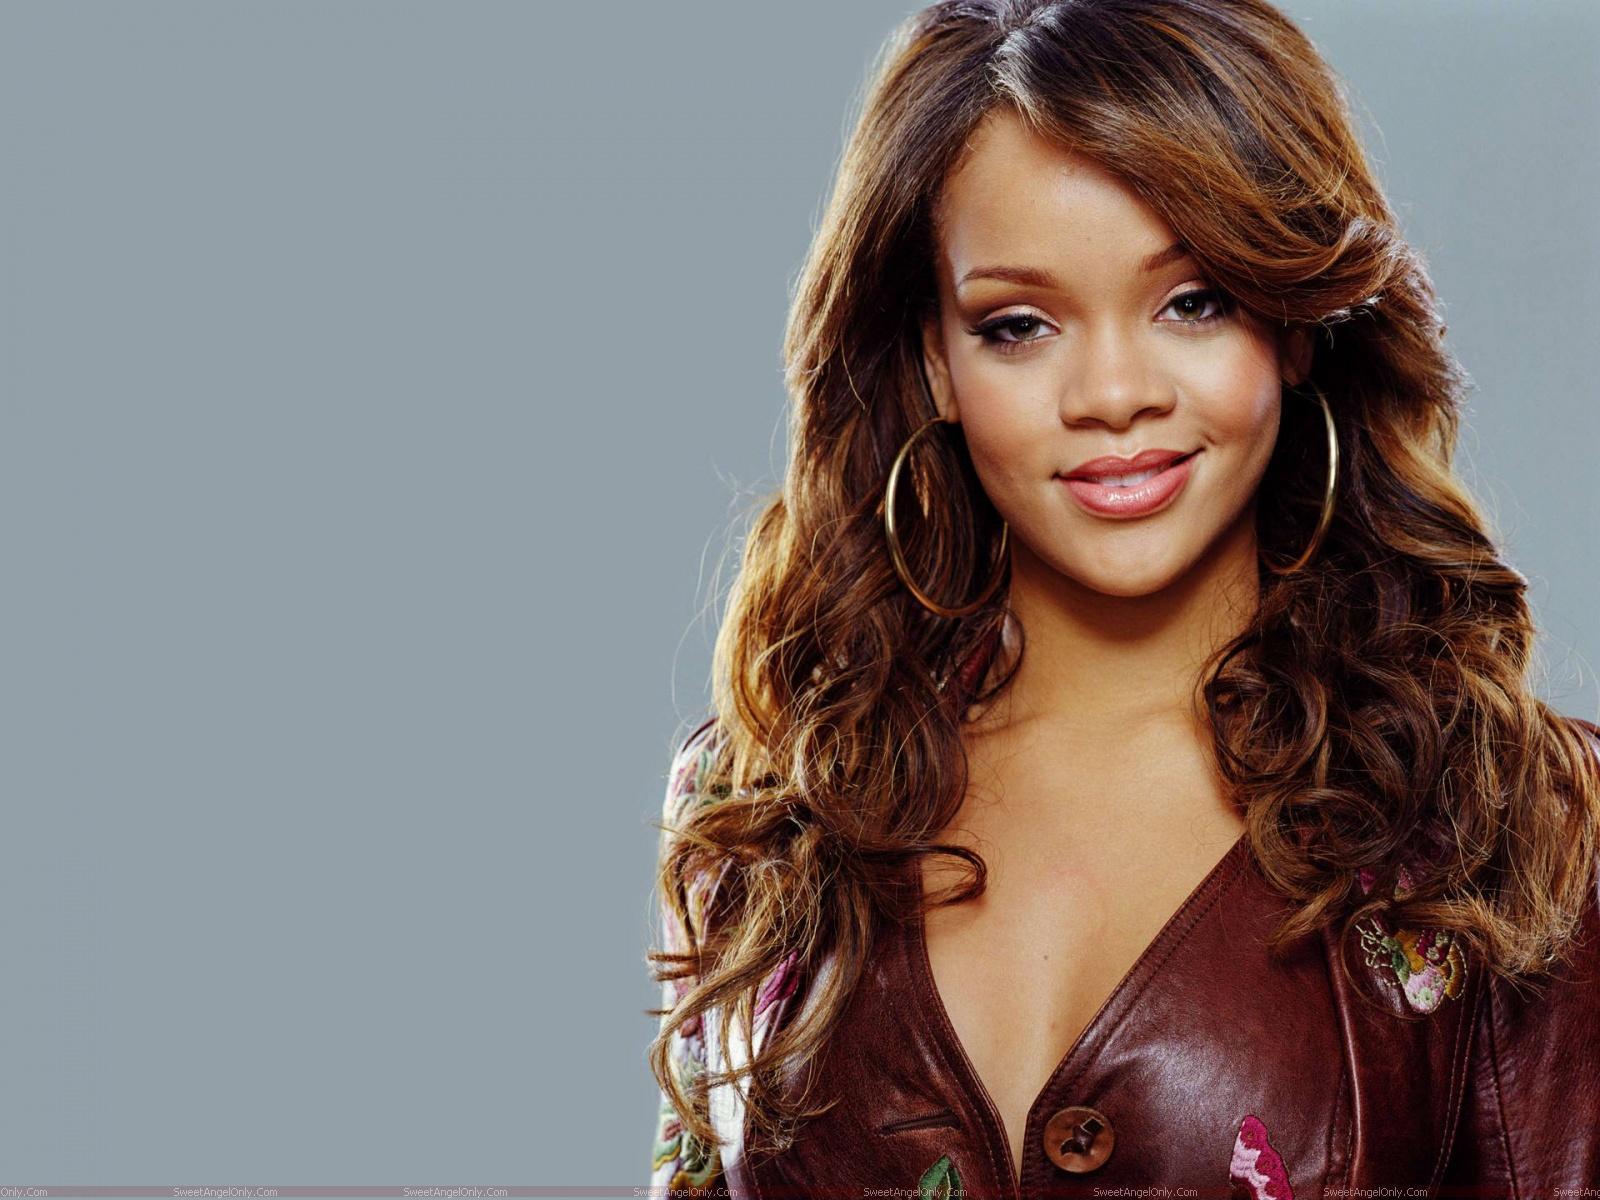 Rihanna: Rihanna-Biography, Hot HD Pictures